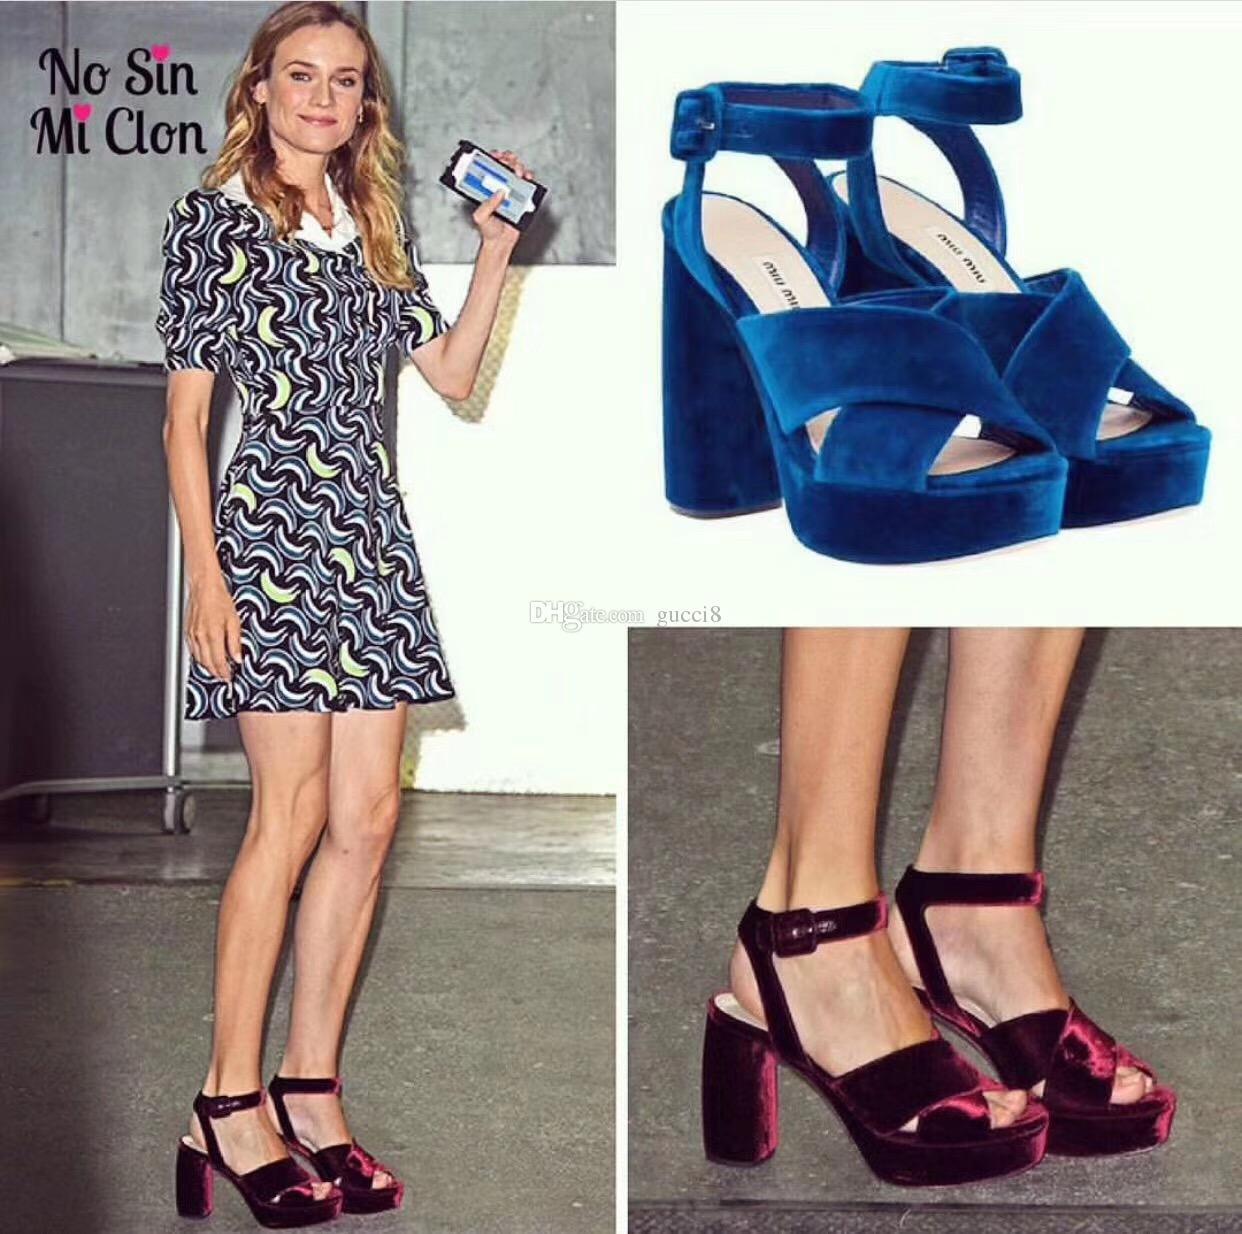 Wine Red Royal Blue Velvet Platform Sandals Criss Cross Buckle High heels Ladies Gladiators Summer Party Shoes